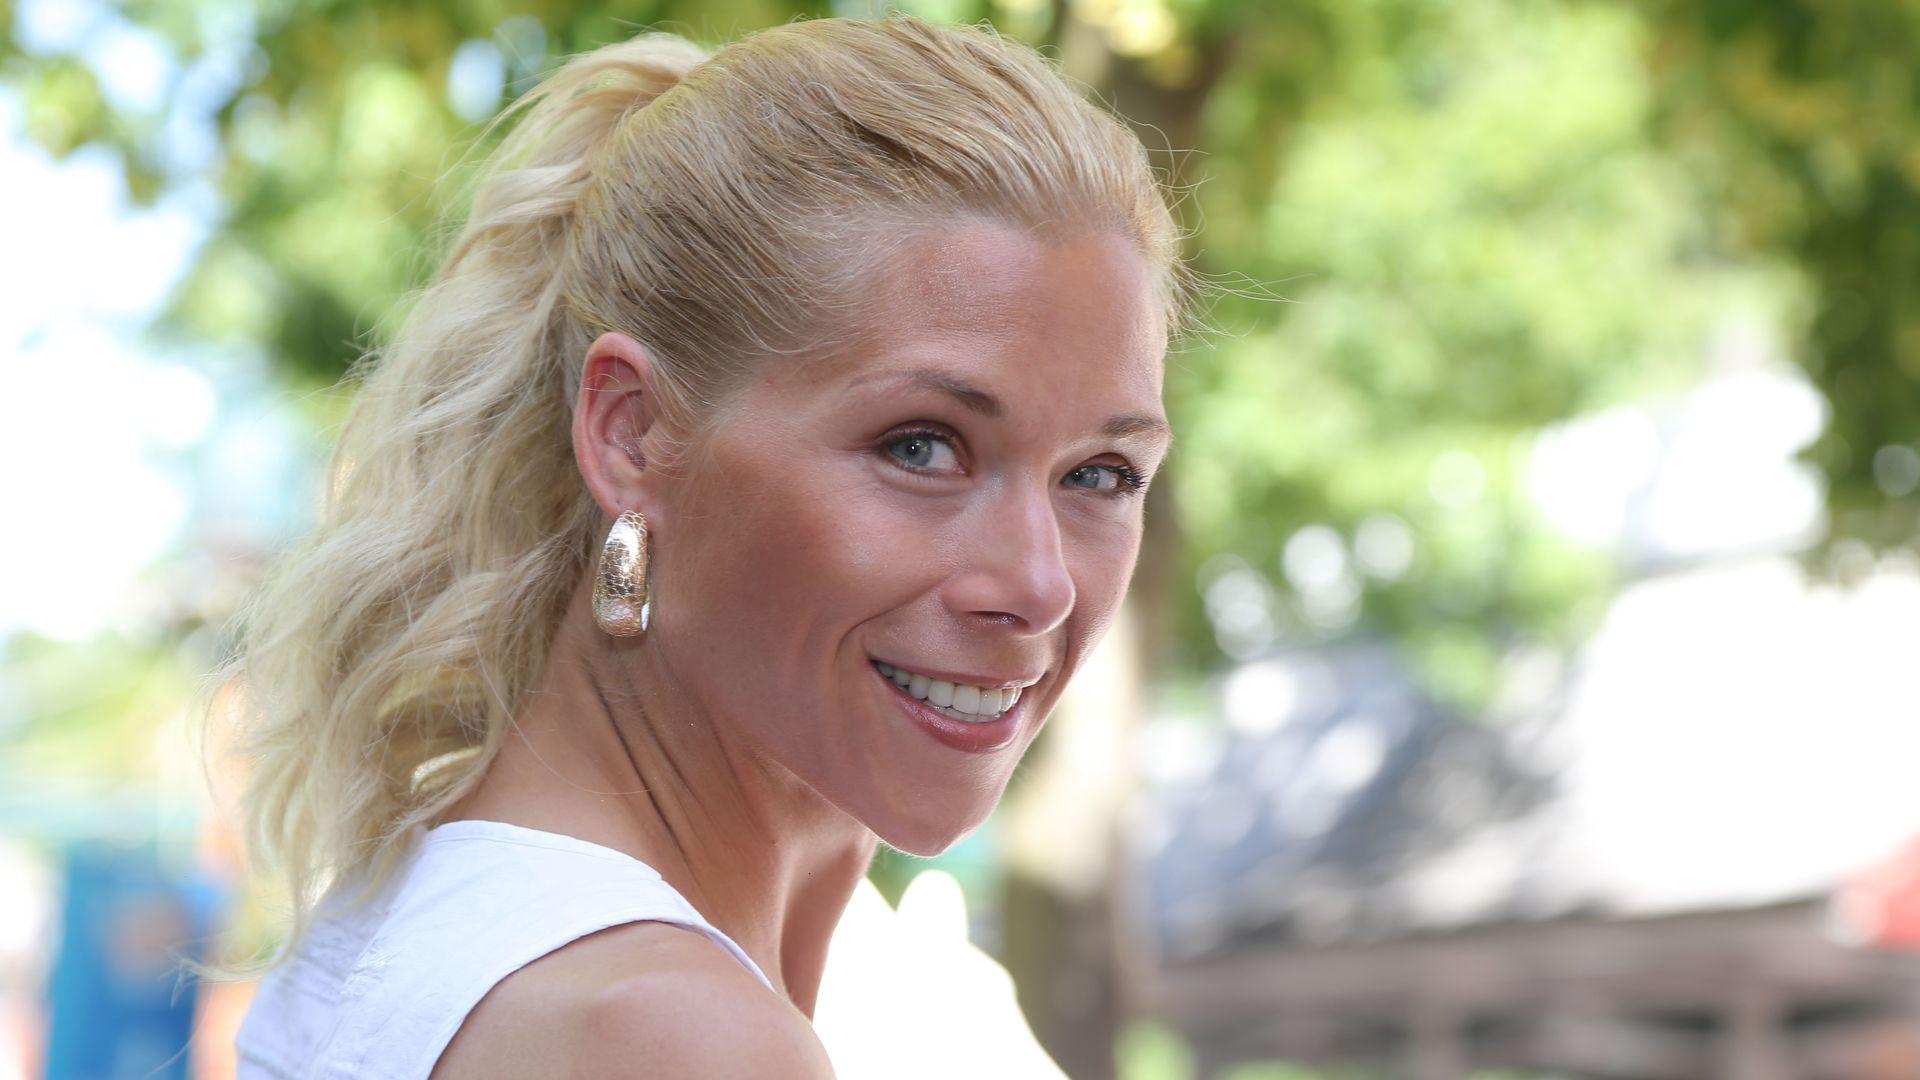 Beinahe gestorben: Tanja Szewczenko war schwer krank